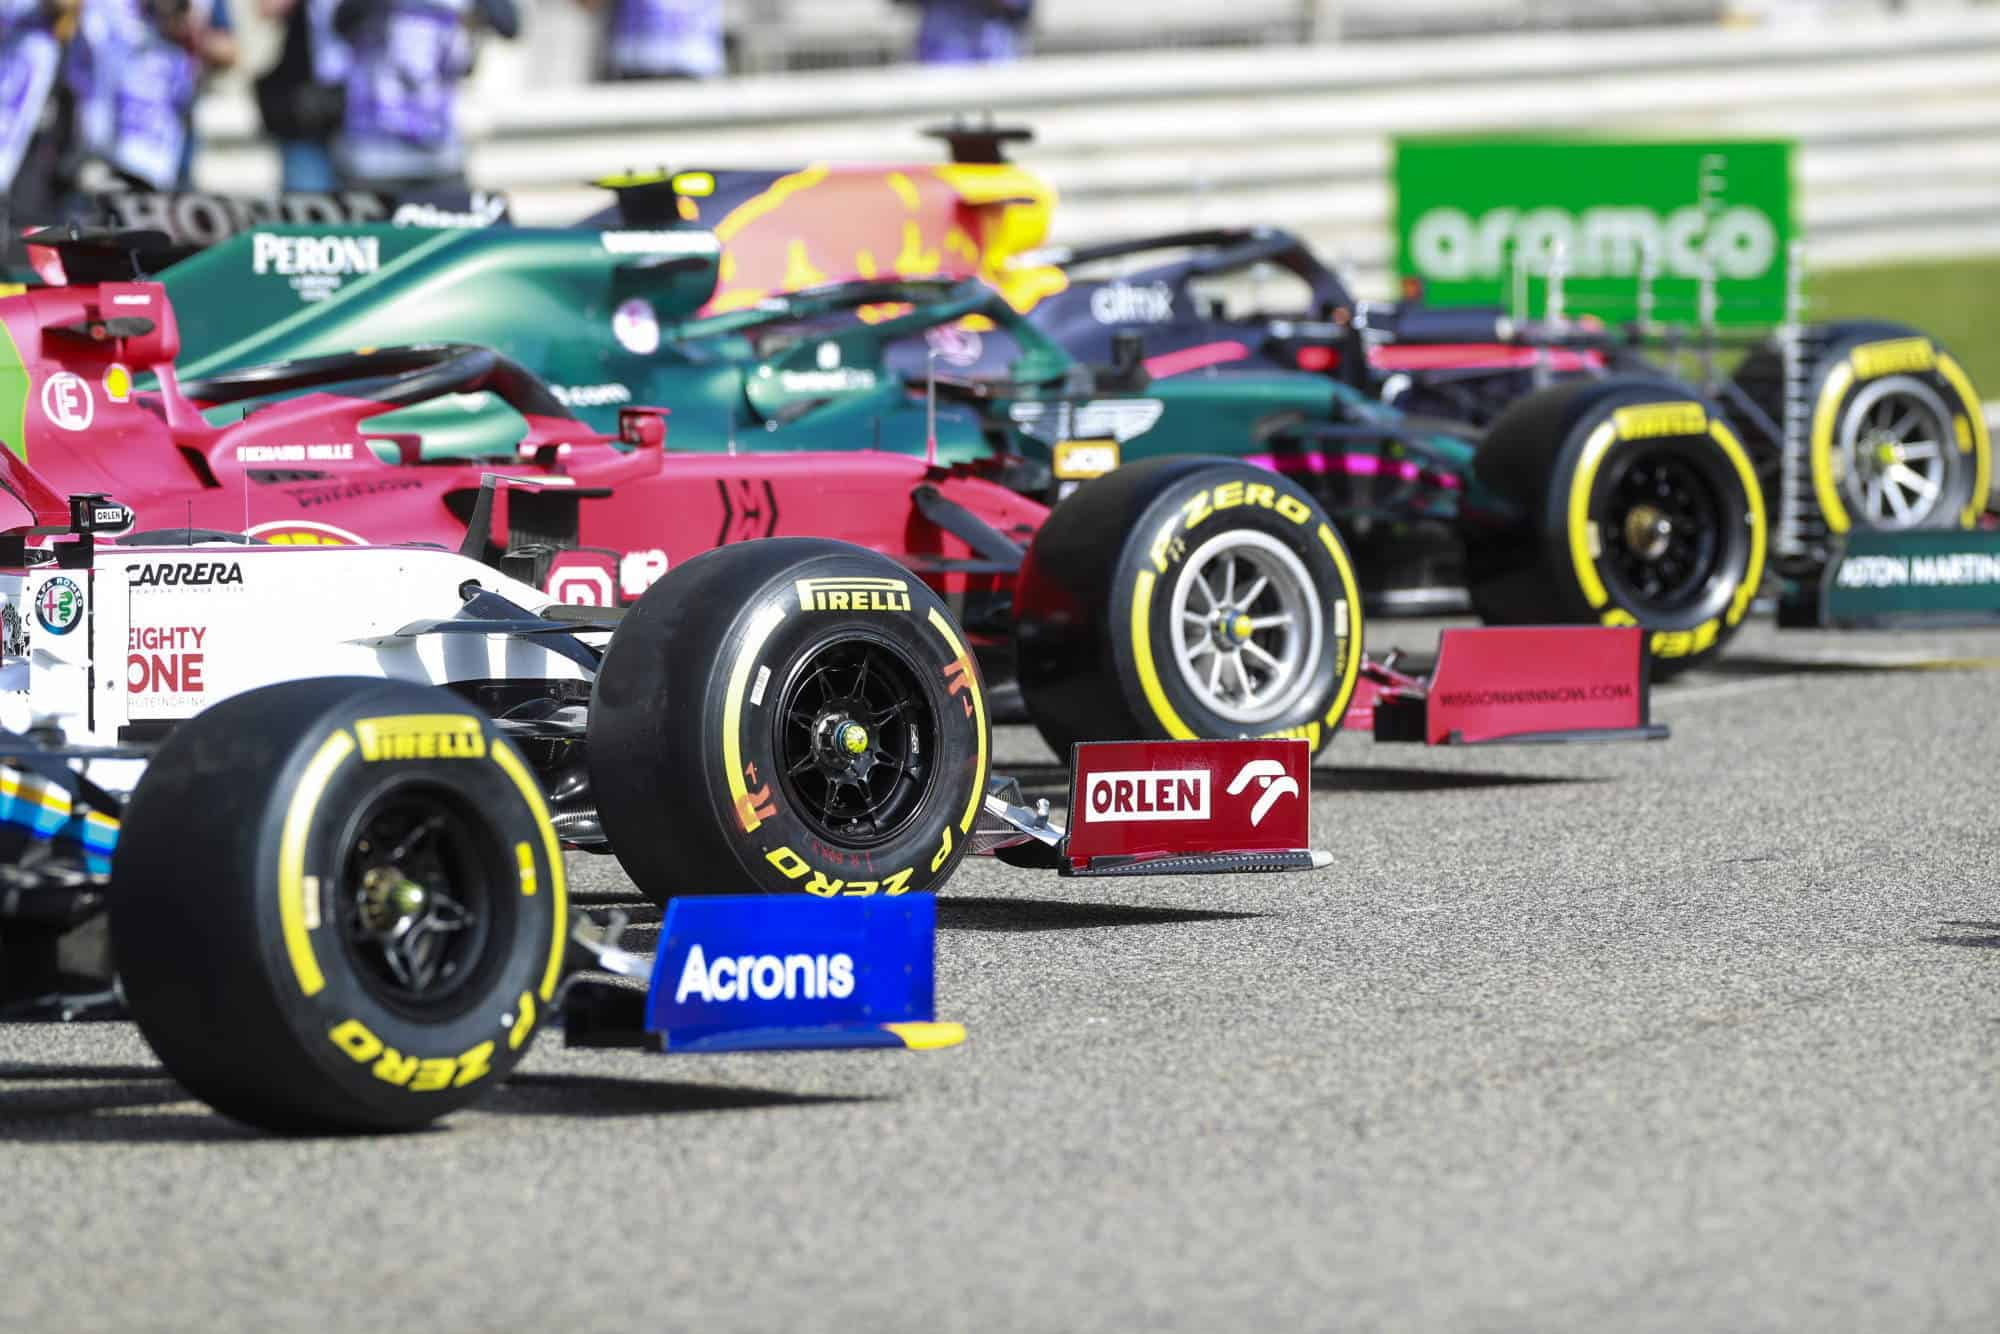 2021 Bahrain F1 testing McLaren Alfa Romeo Ferrari Aston Martin Red Bull Photo Pirelli